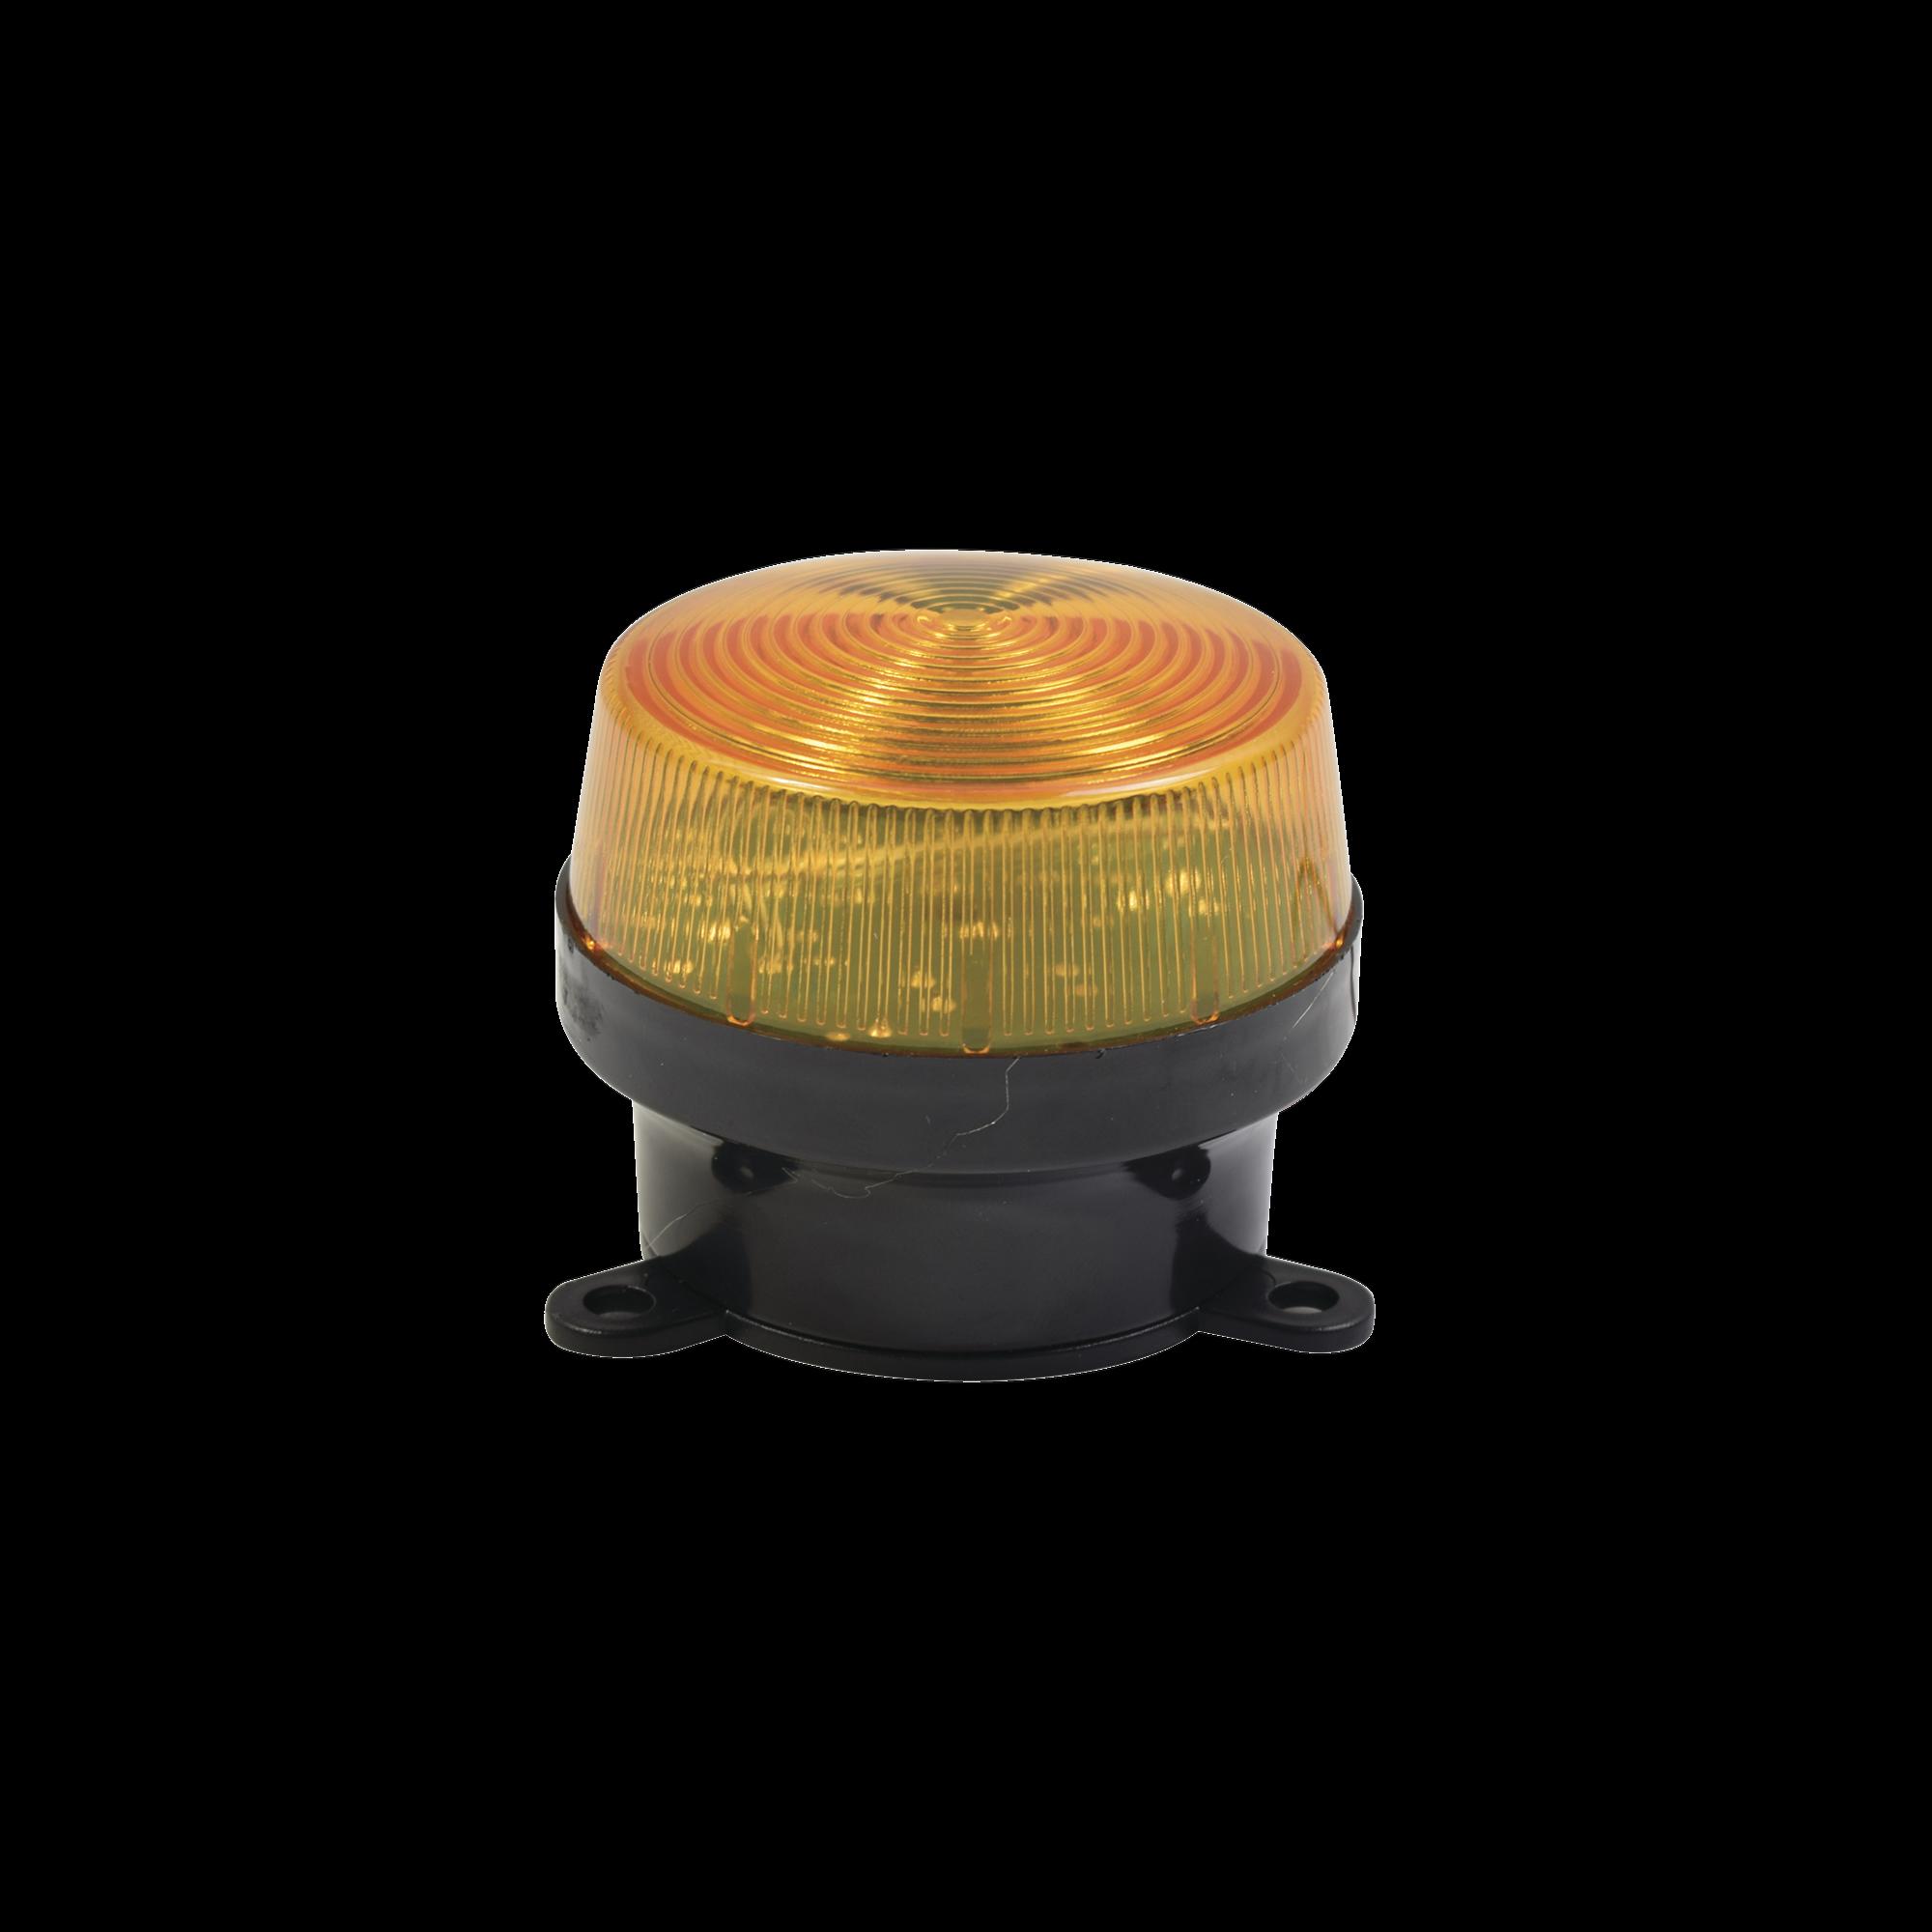 Mini estrobo color Amber con montaje de pestaña.